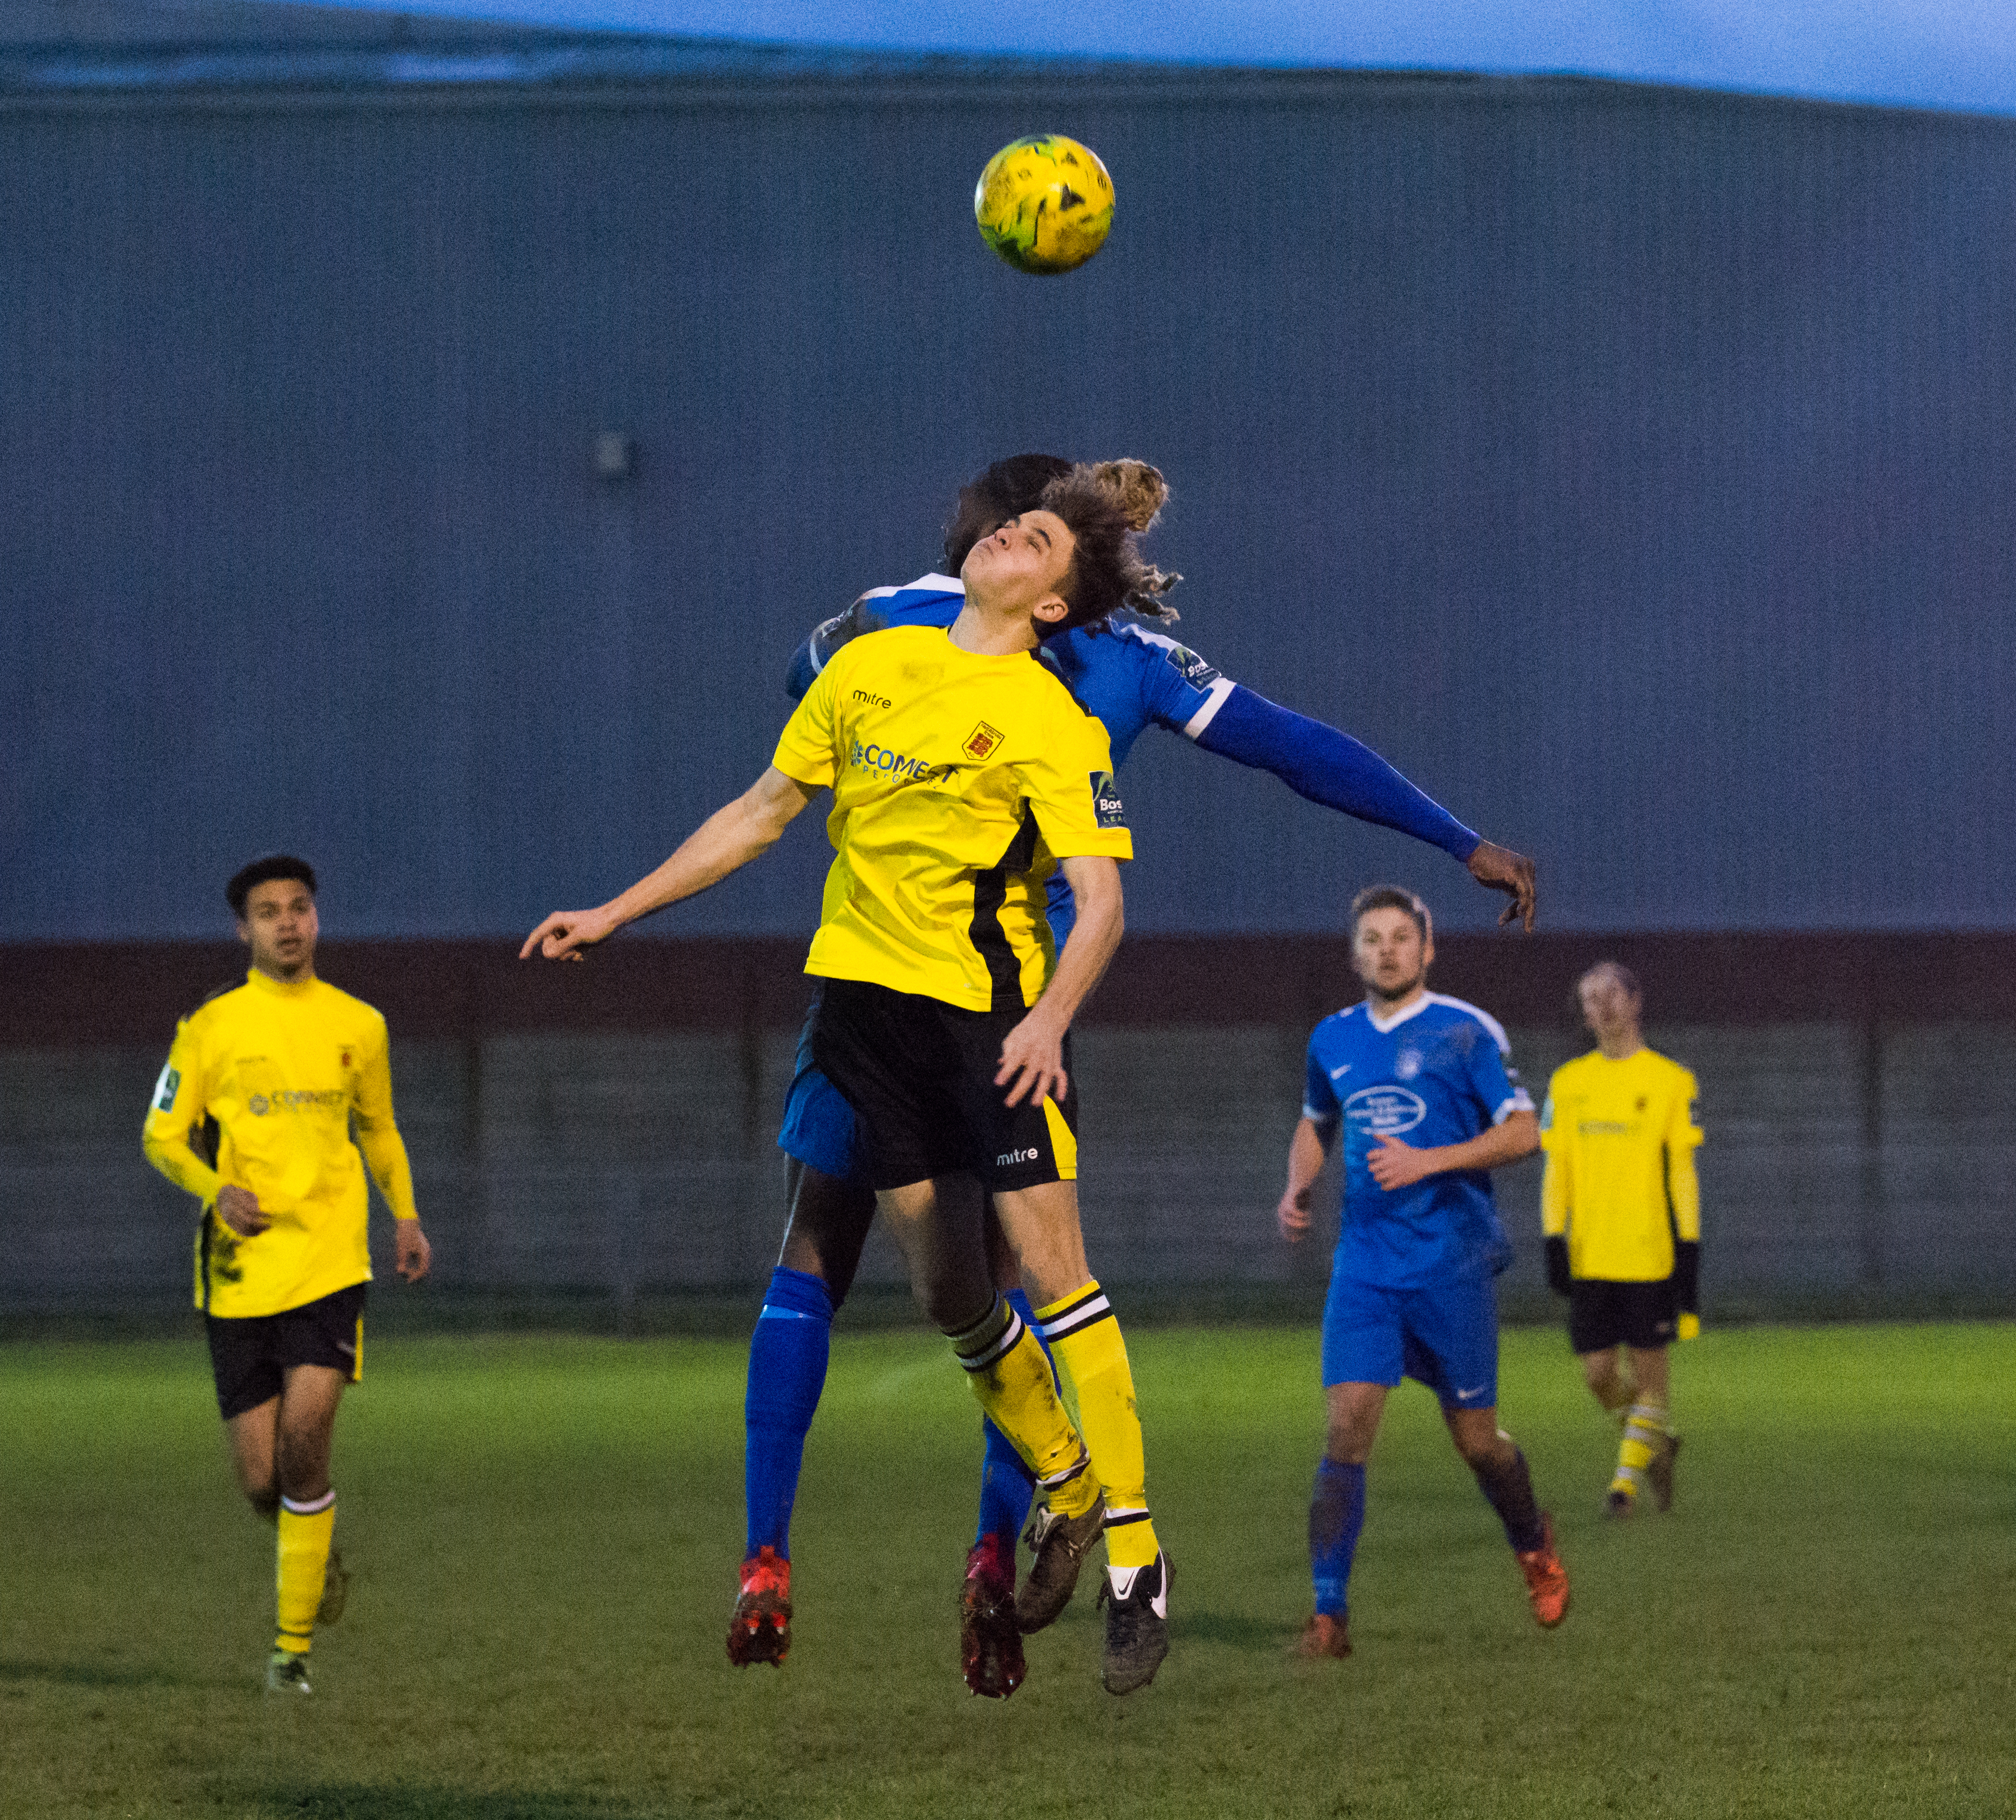 Shoreham FC vs Faversham Town 16.12.17 54